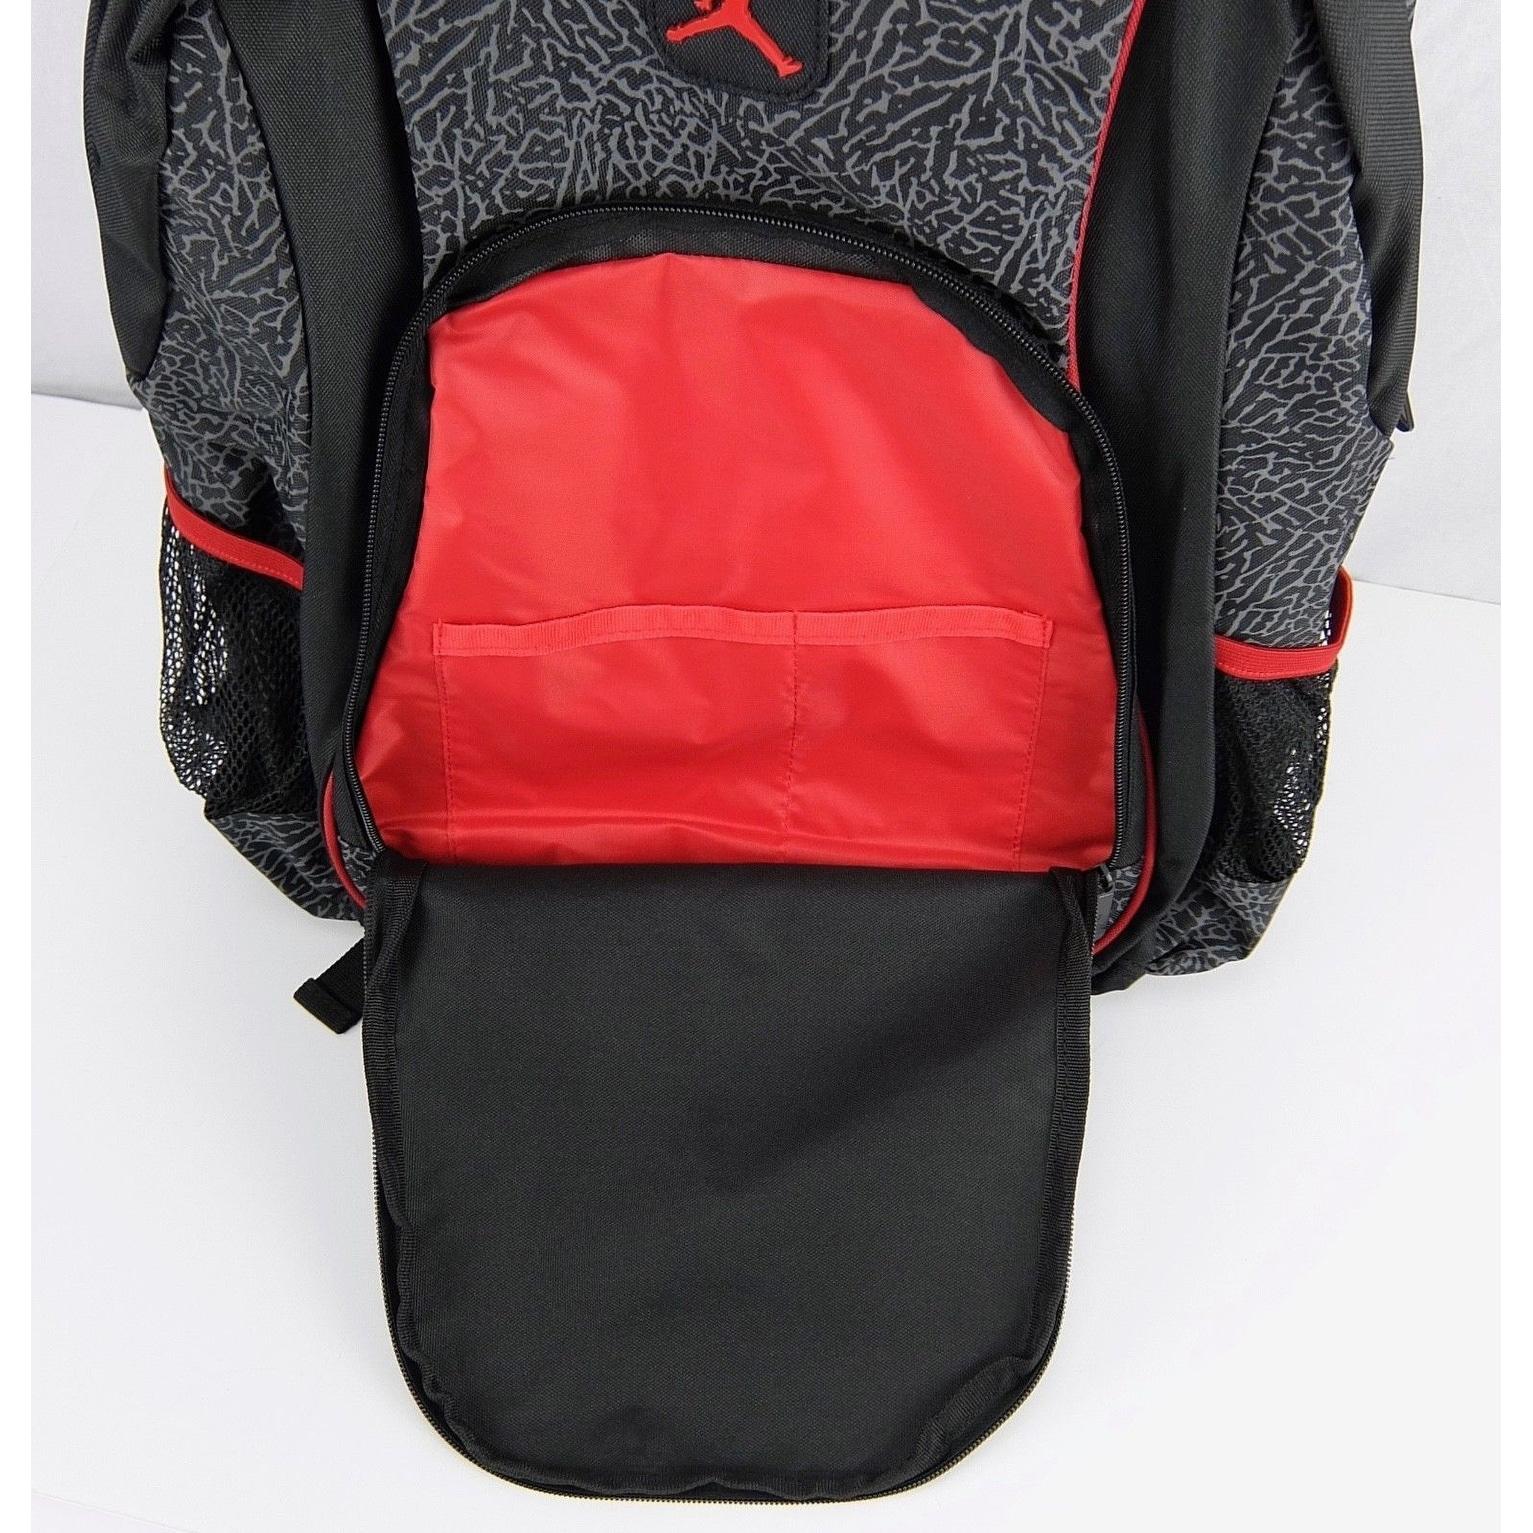 94f81da07a Shop Nike Jordan Elephant 2-Strap School Backpack - Black Red ...